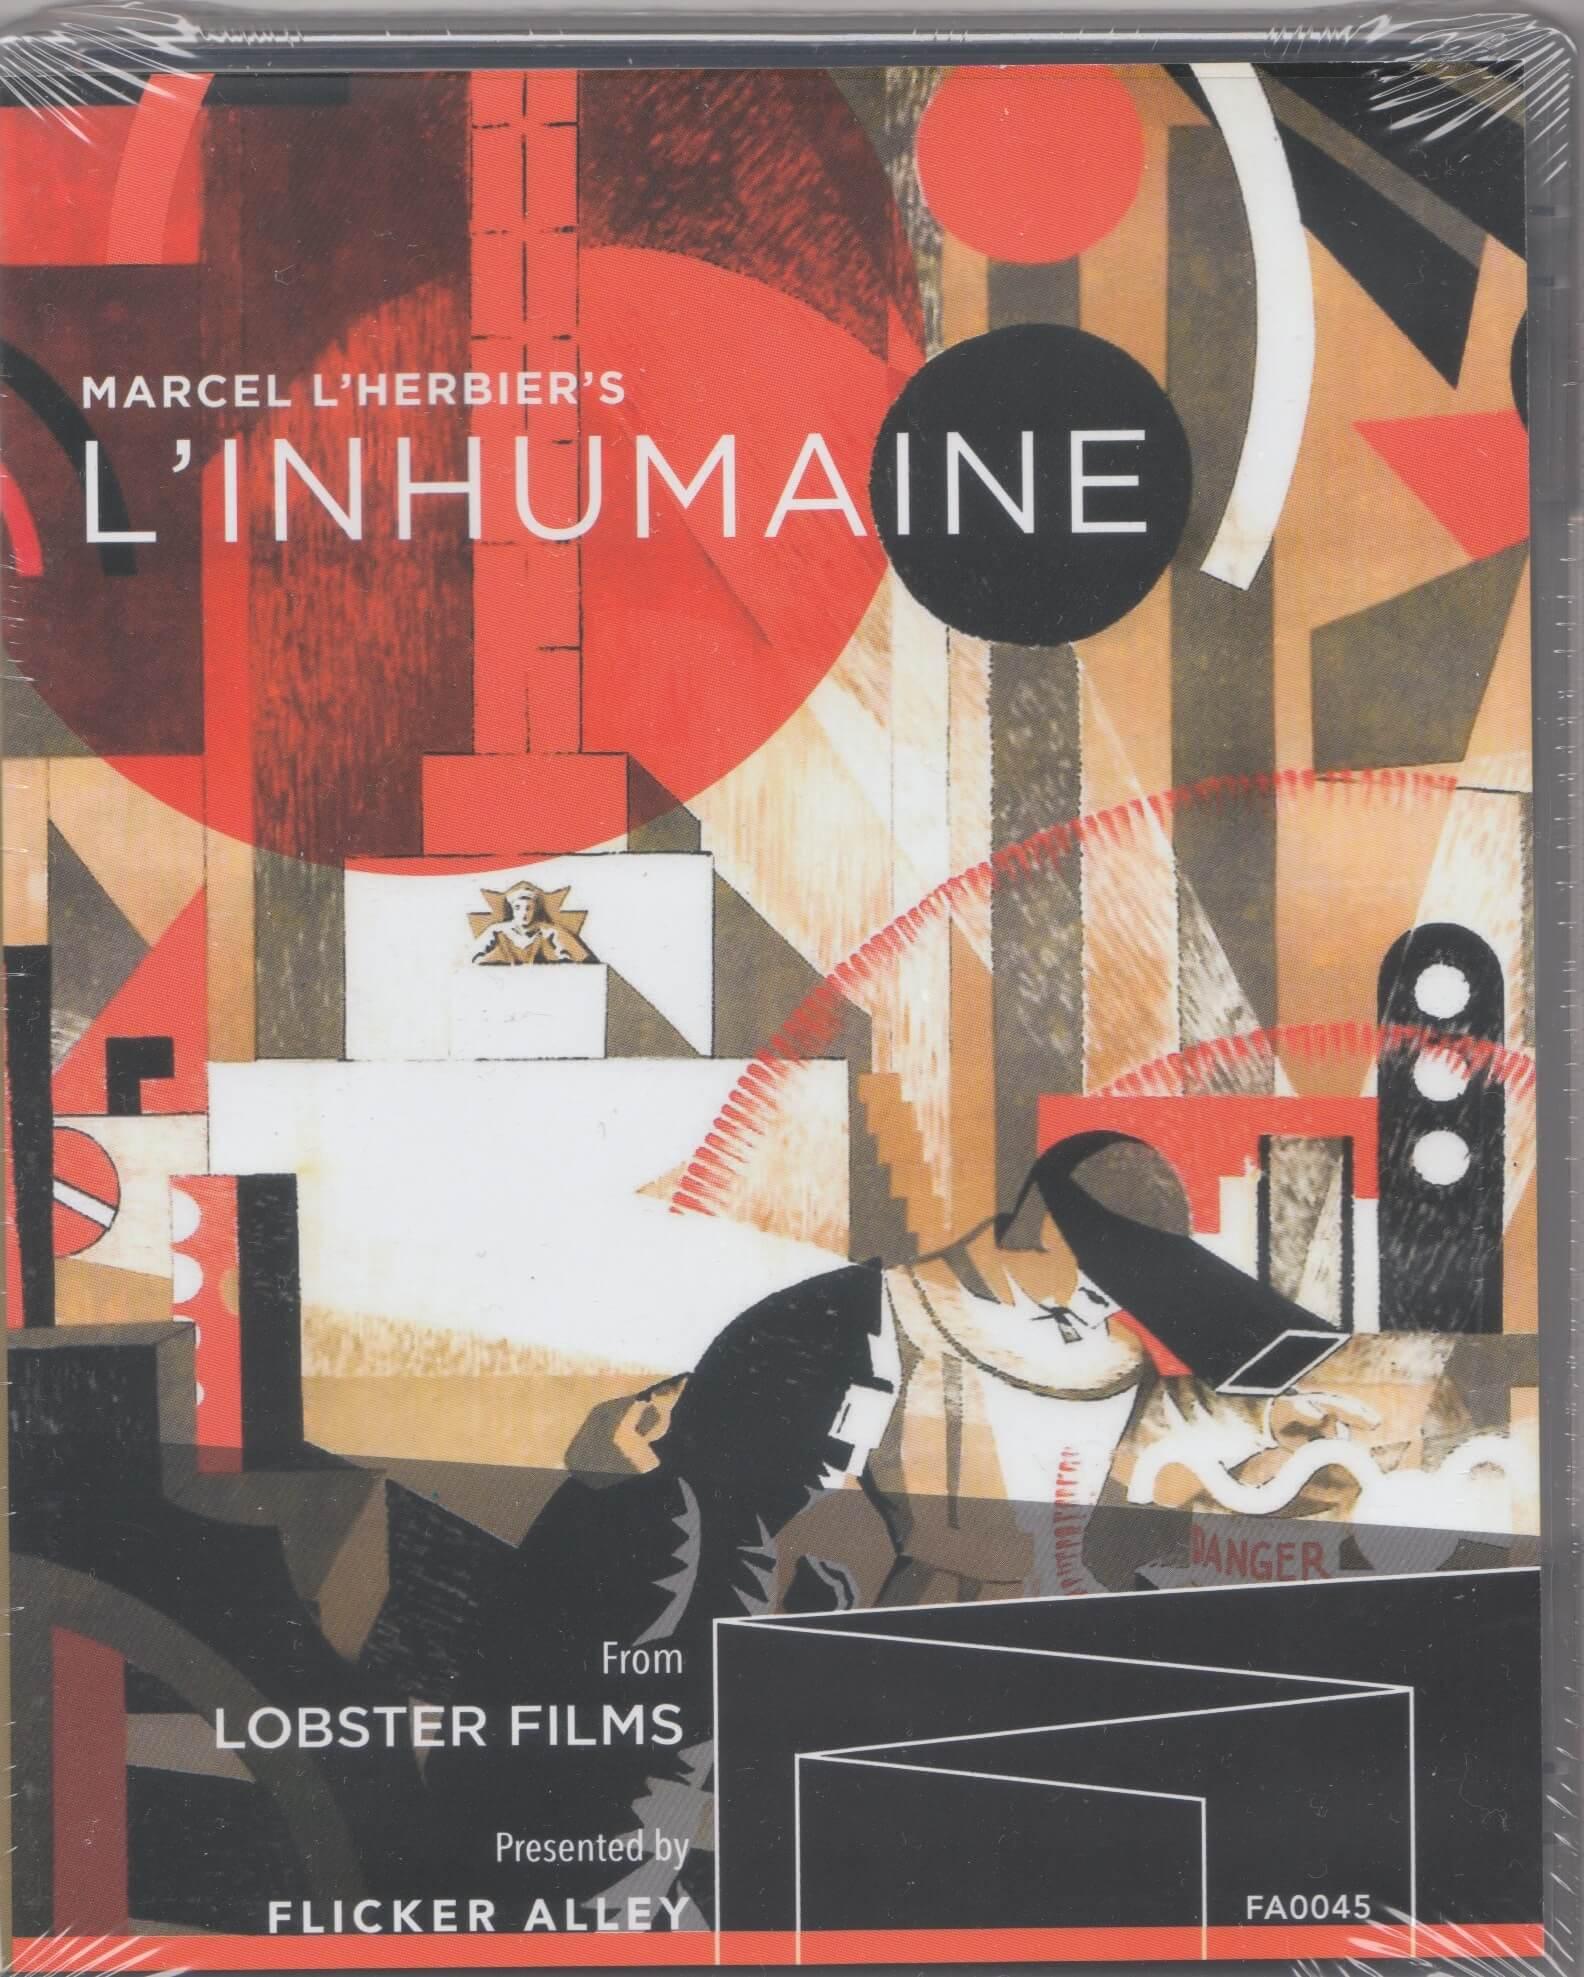 L'Inhumaine BluRay copy